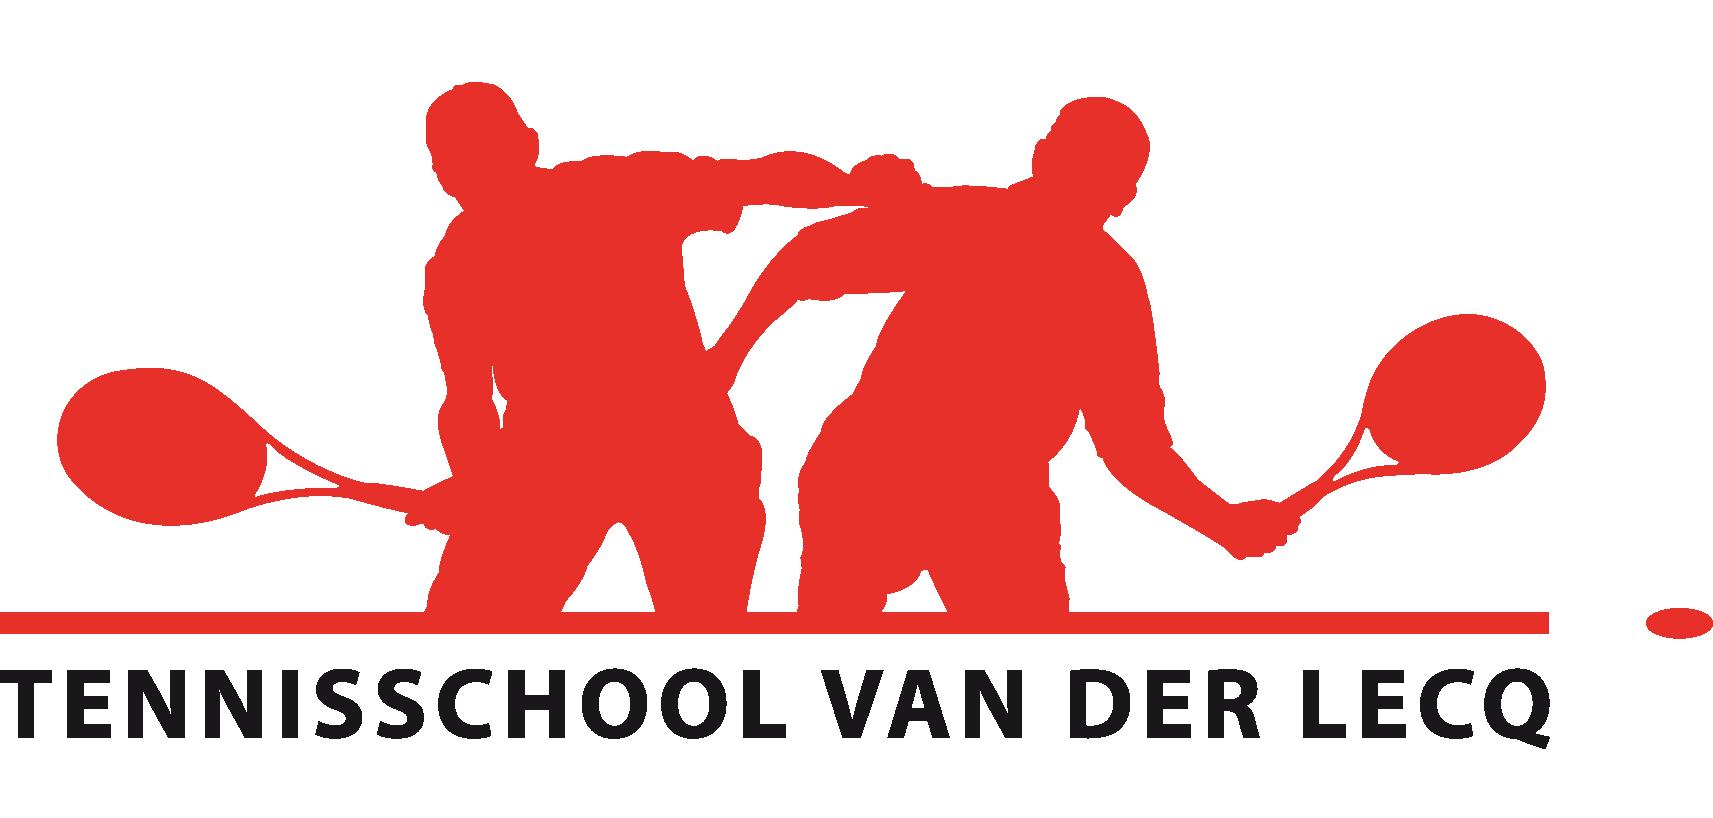 Tennisschool Van der Lecq